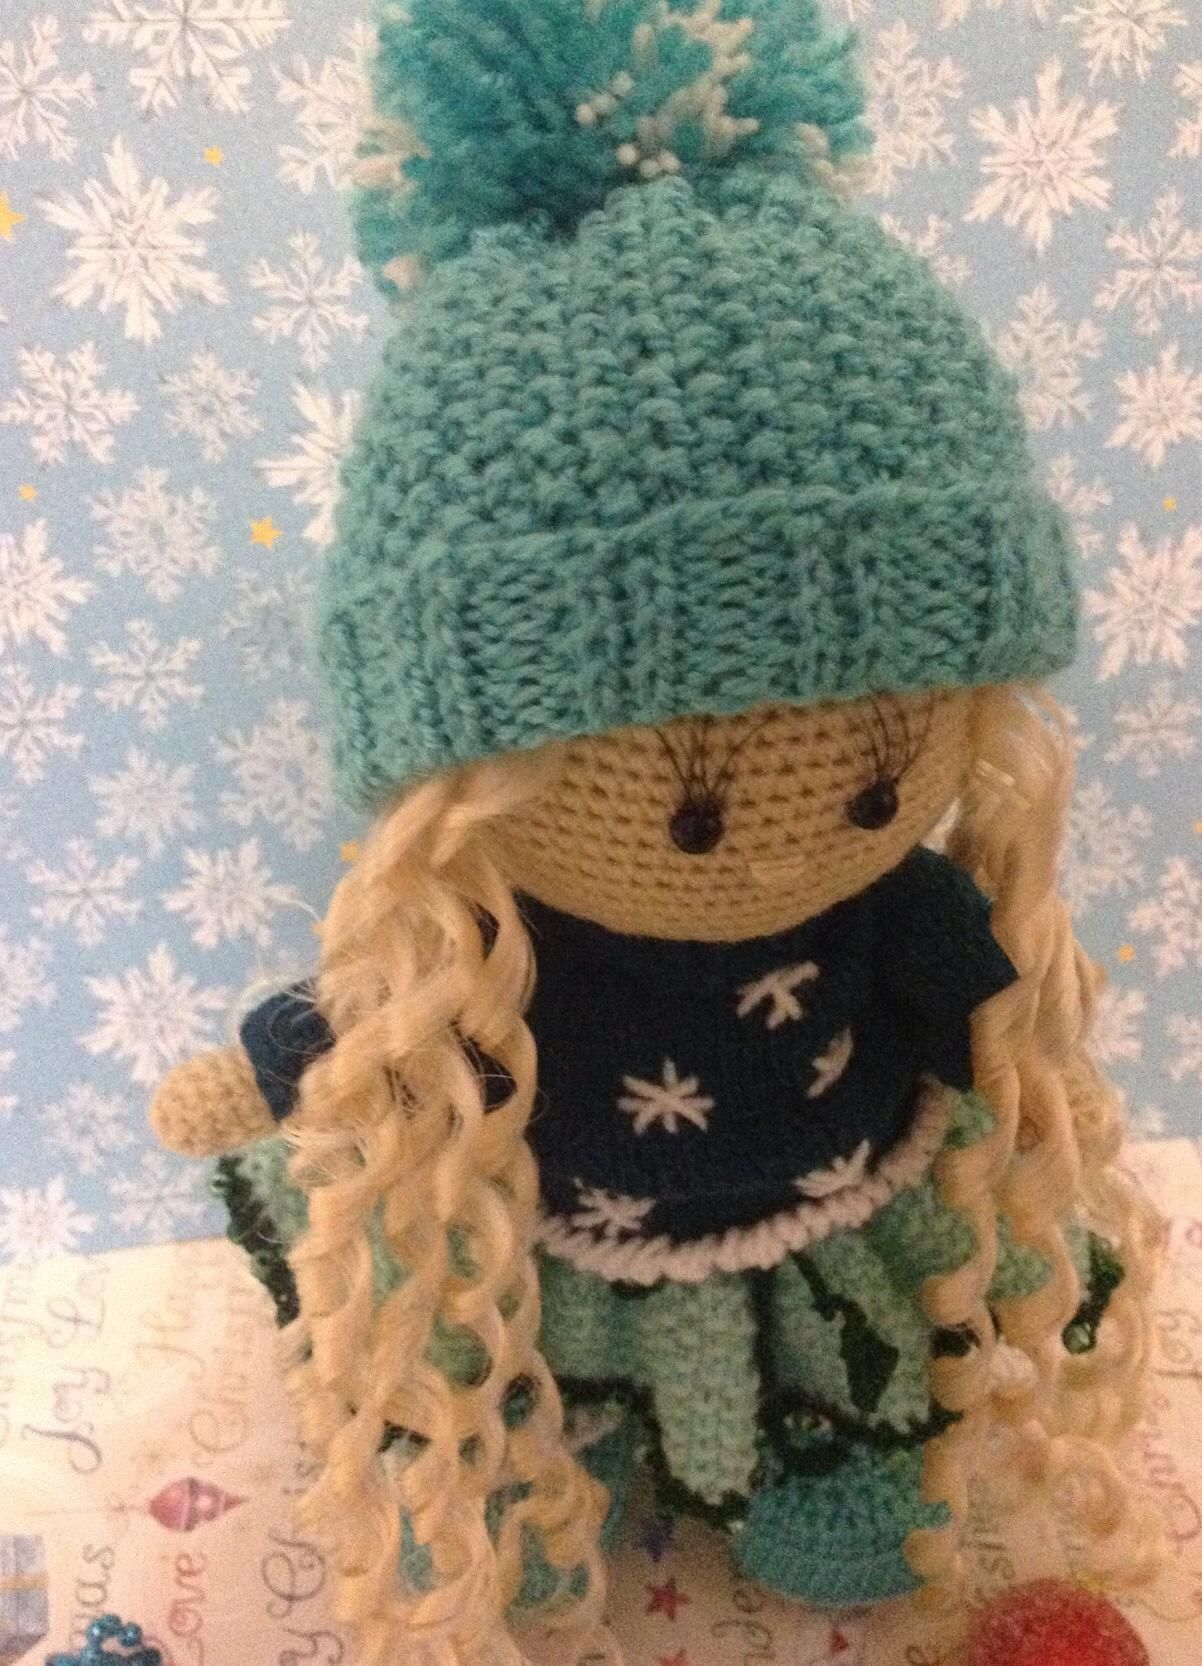 doll toy gift kids knitting